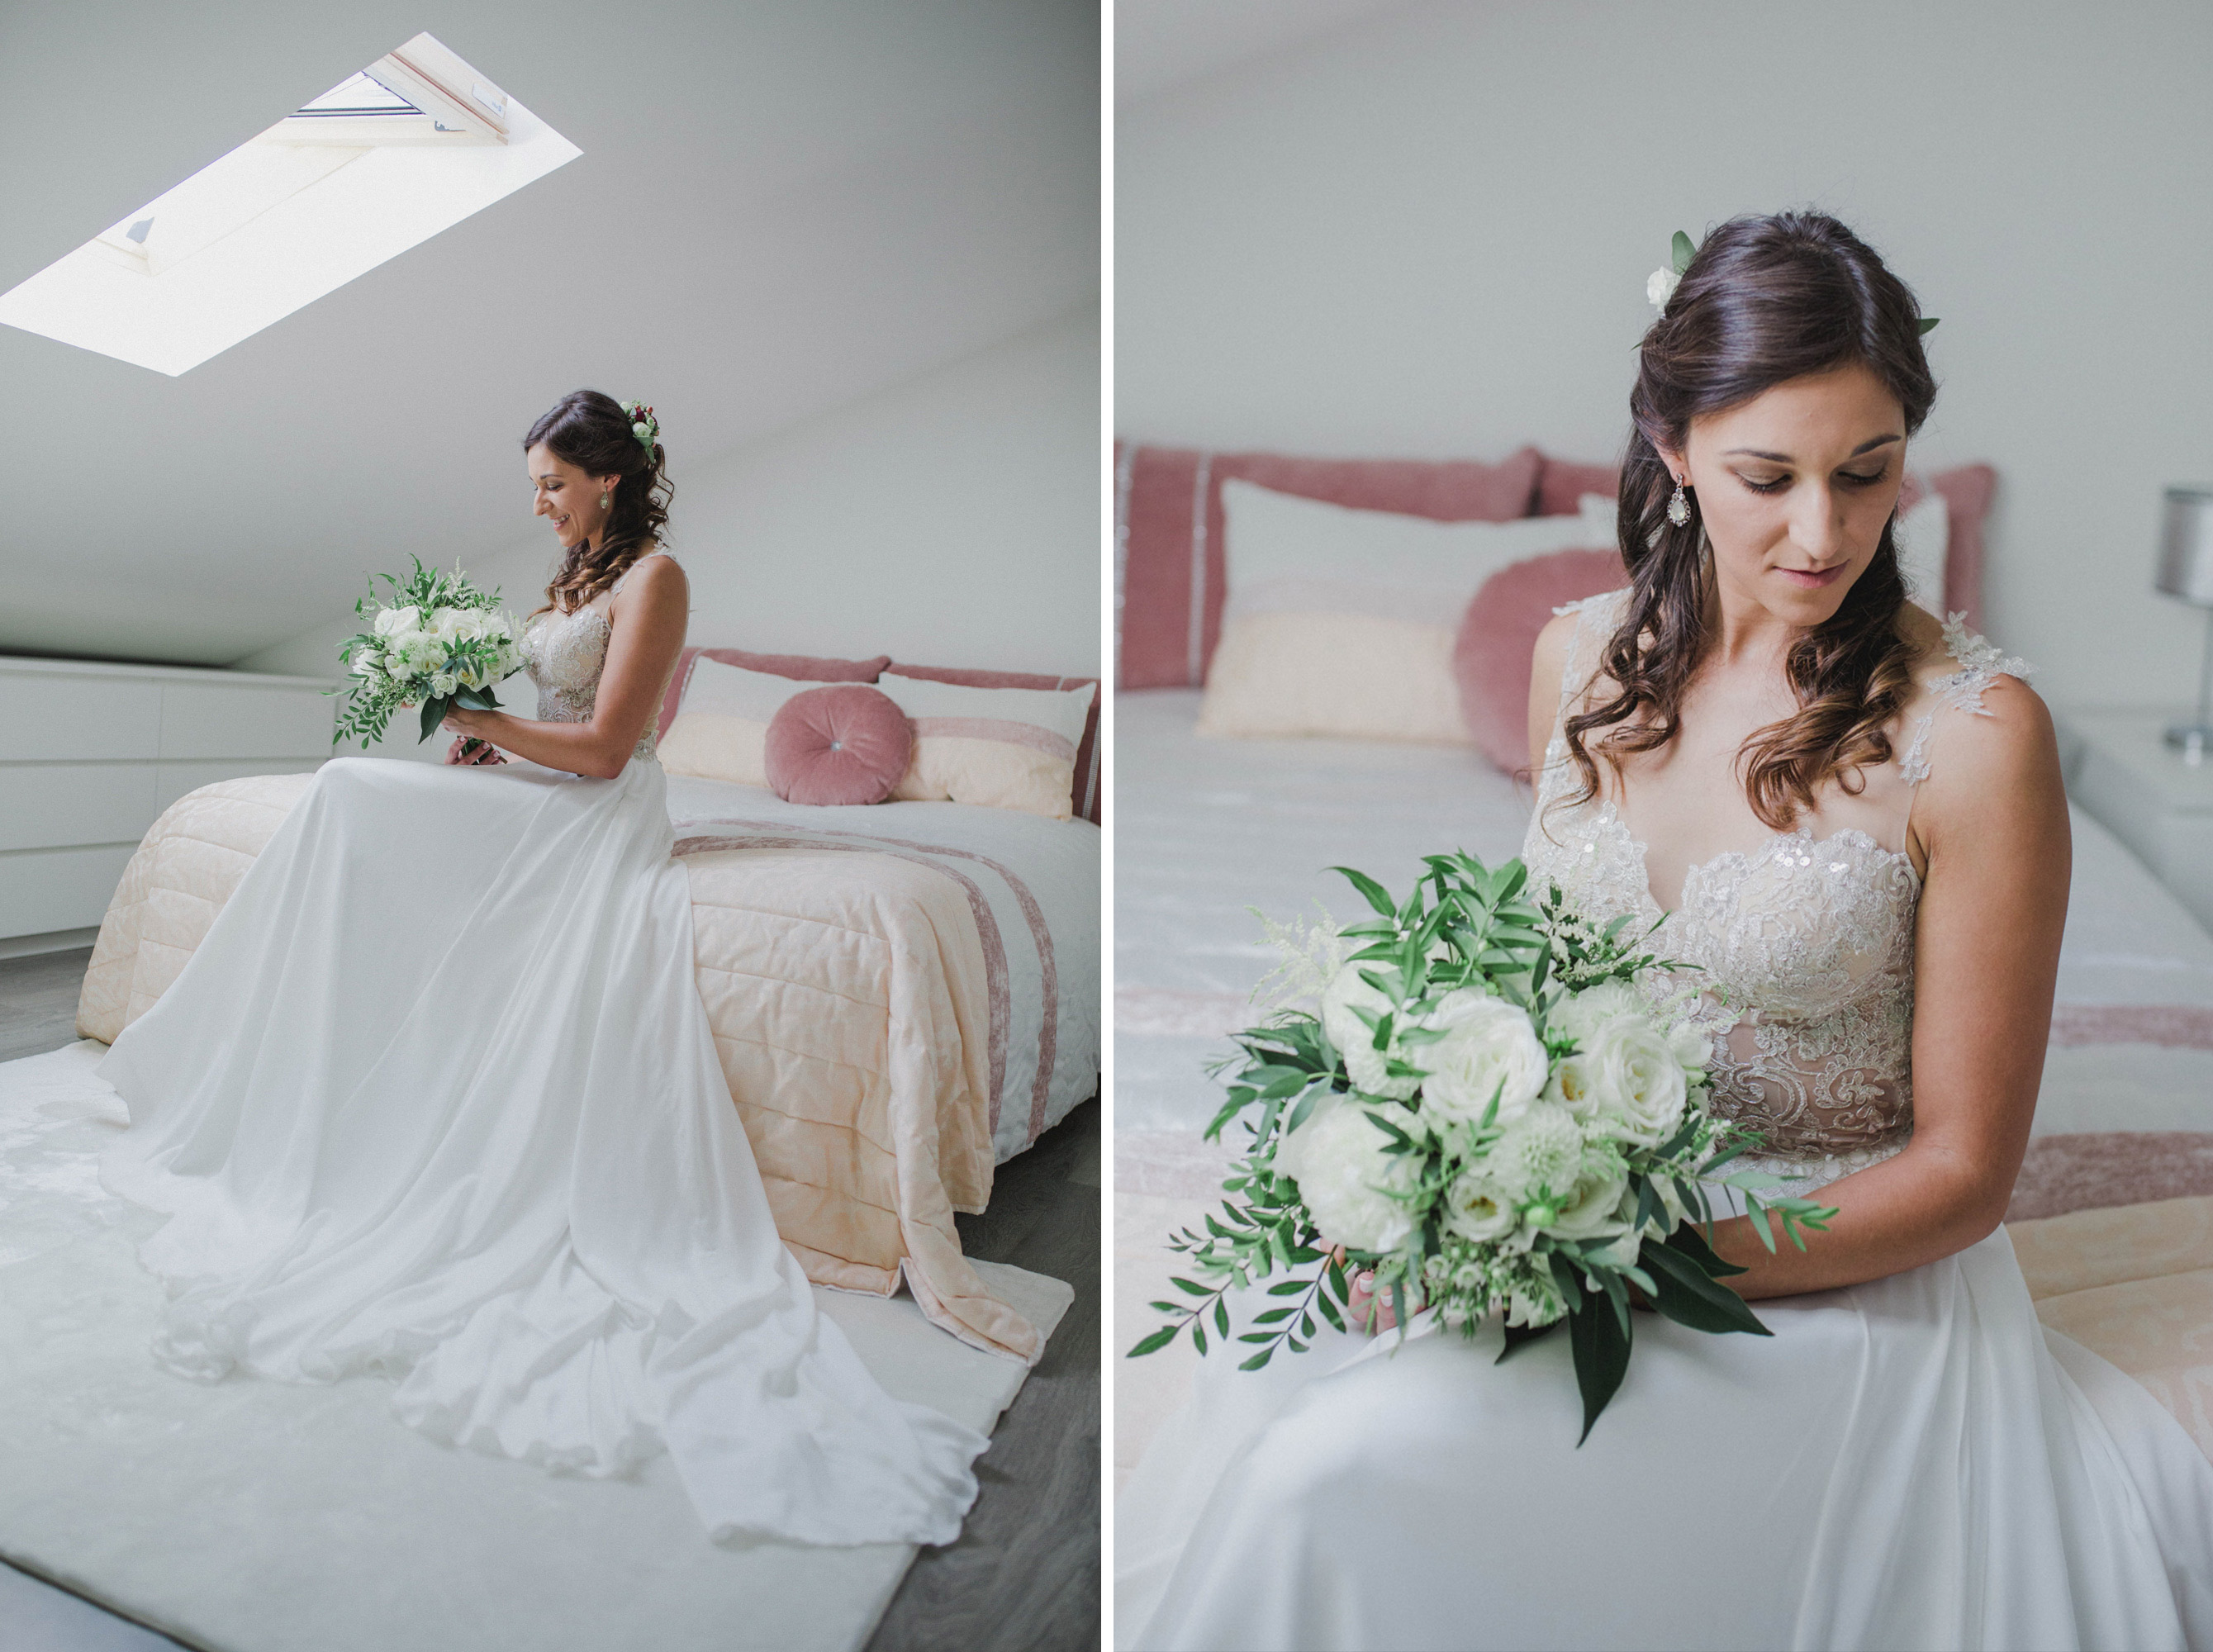 077-carina-e-samuel-wedding-casamento-quinta-dos-rouxinois-rustico-my-fancy-wedding-mafra-malveira-lisboa-sintra-cascais-filipe-santiago-fotografia-fotografo-lifestyle-destination-portugal